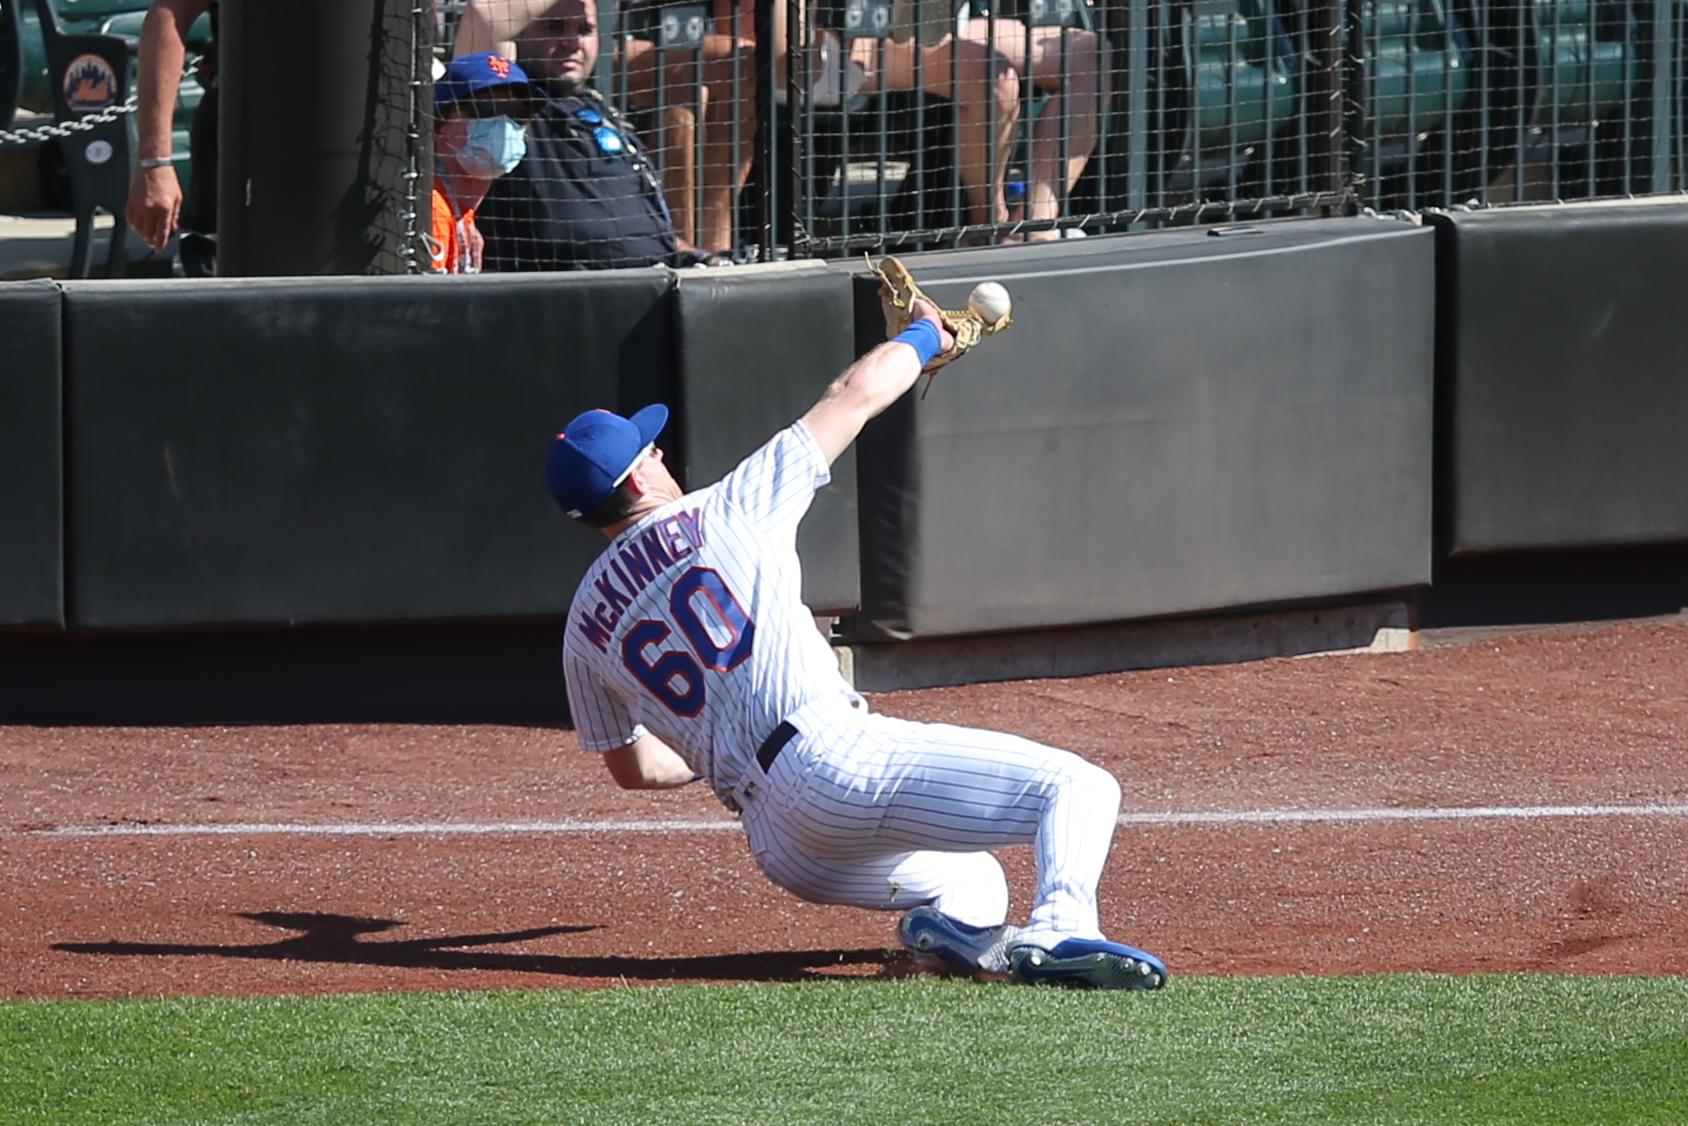 5/29/21 Game Preview: Atlanta Braves at New York Mets